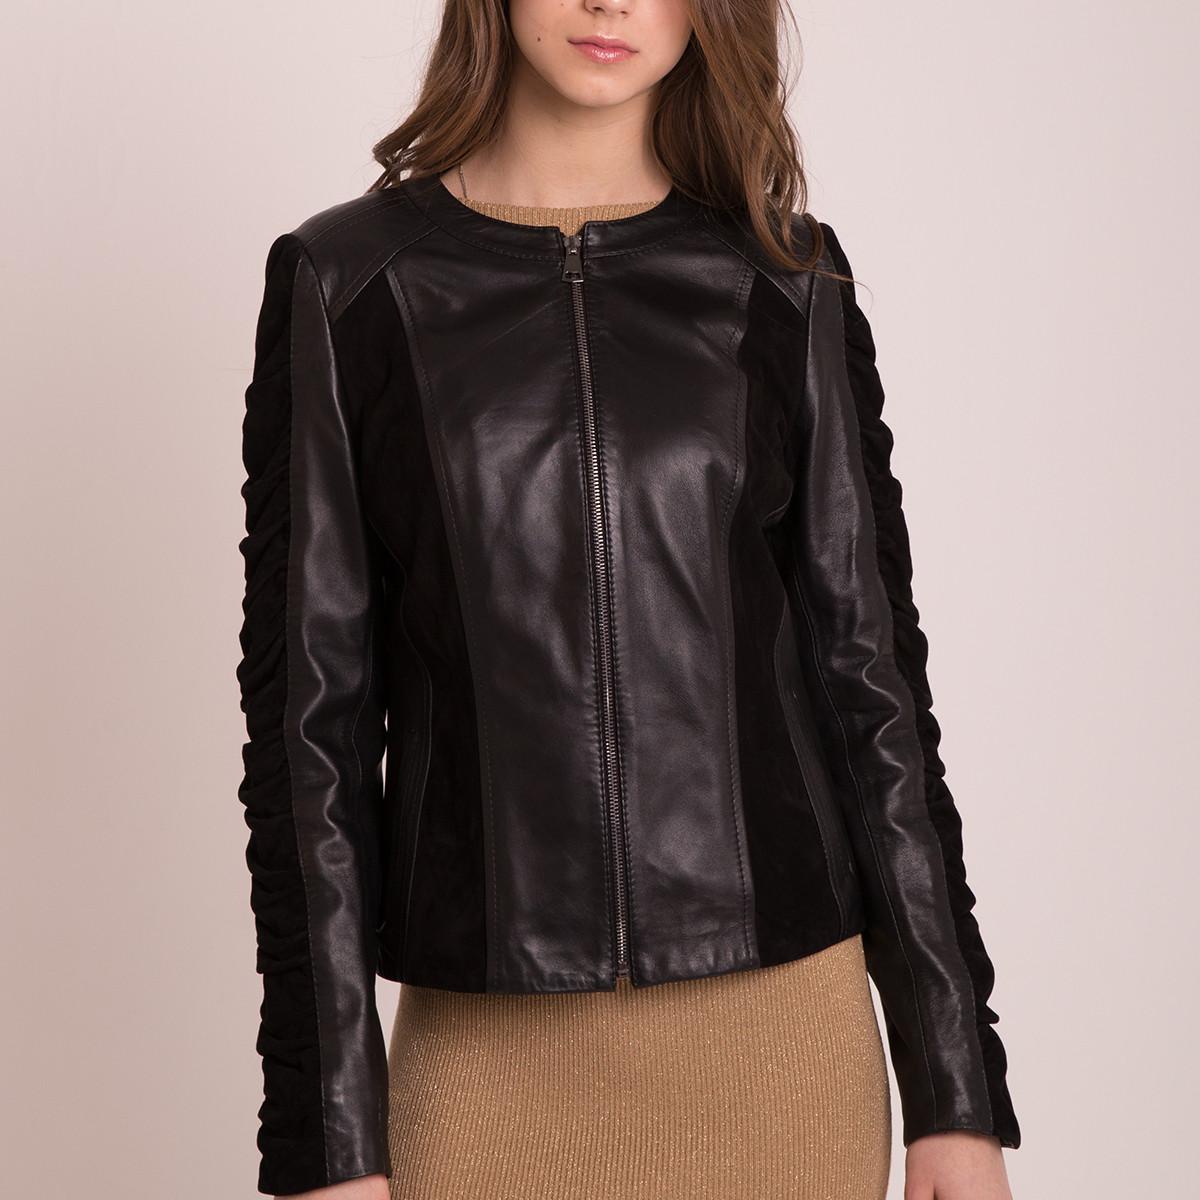 Кожаная куртка с замшей натуральная короткая женская (Арт.MONC201)